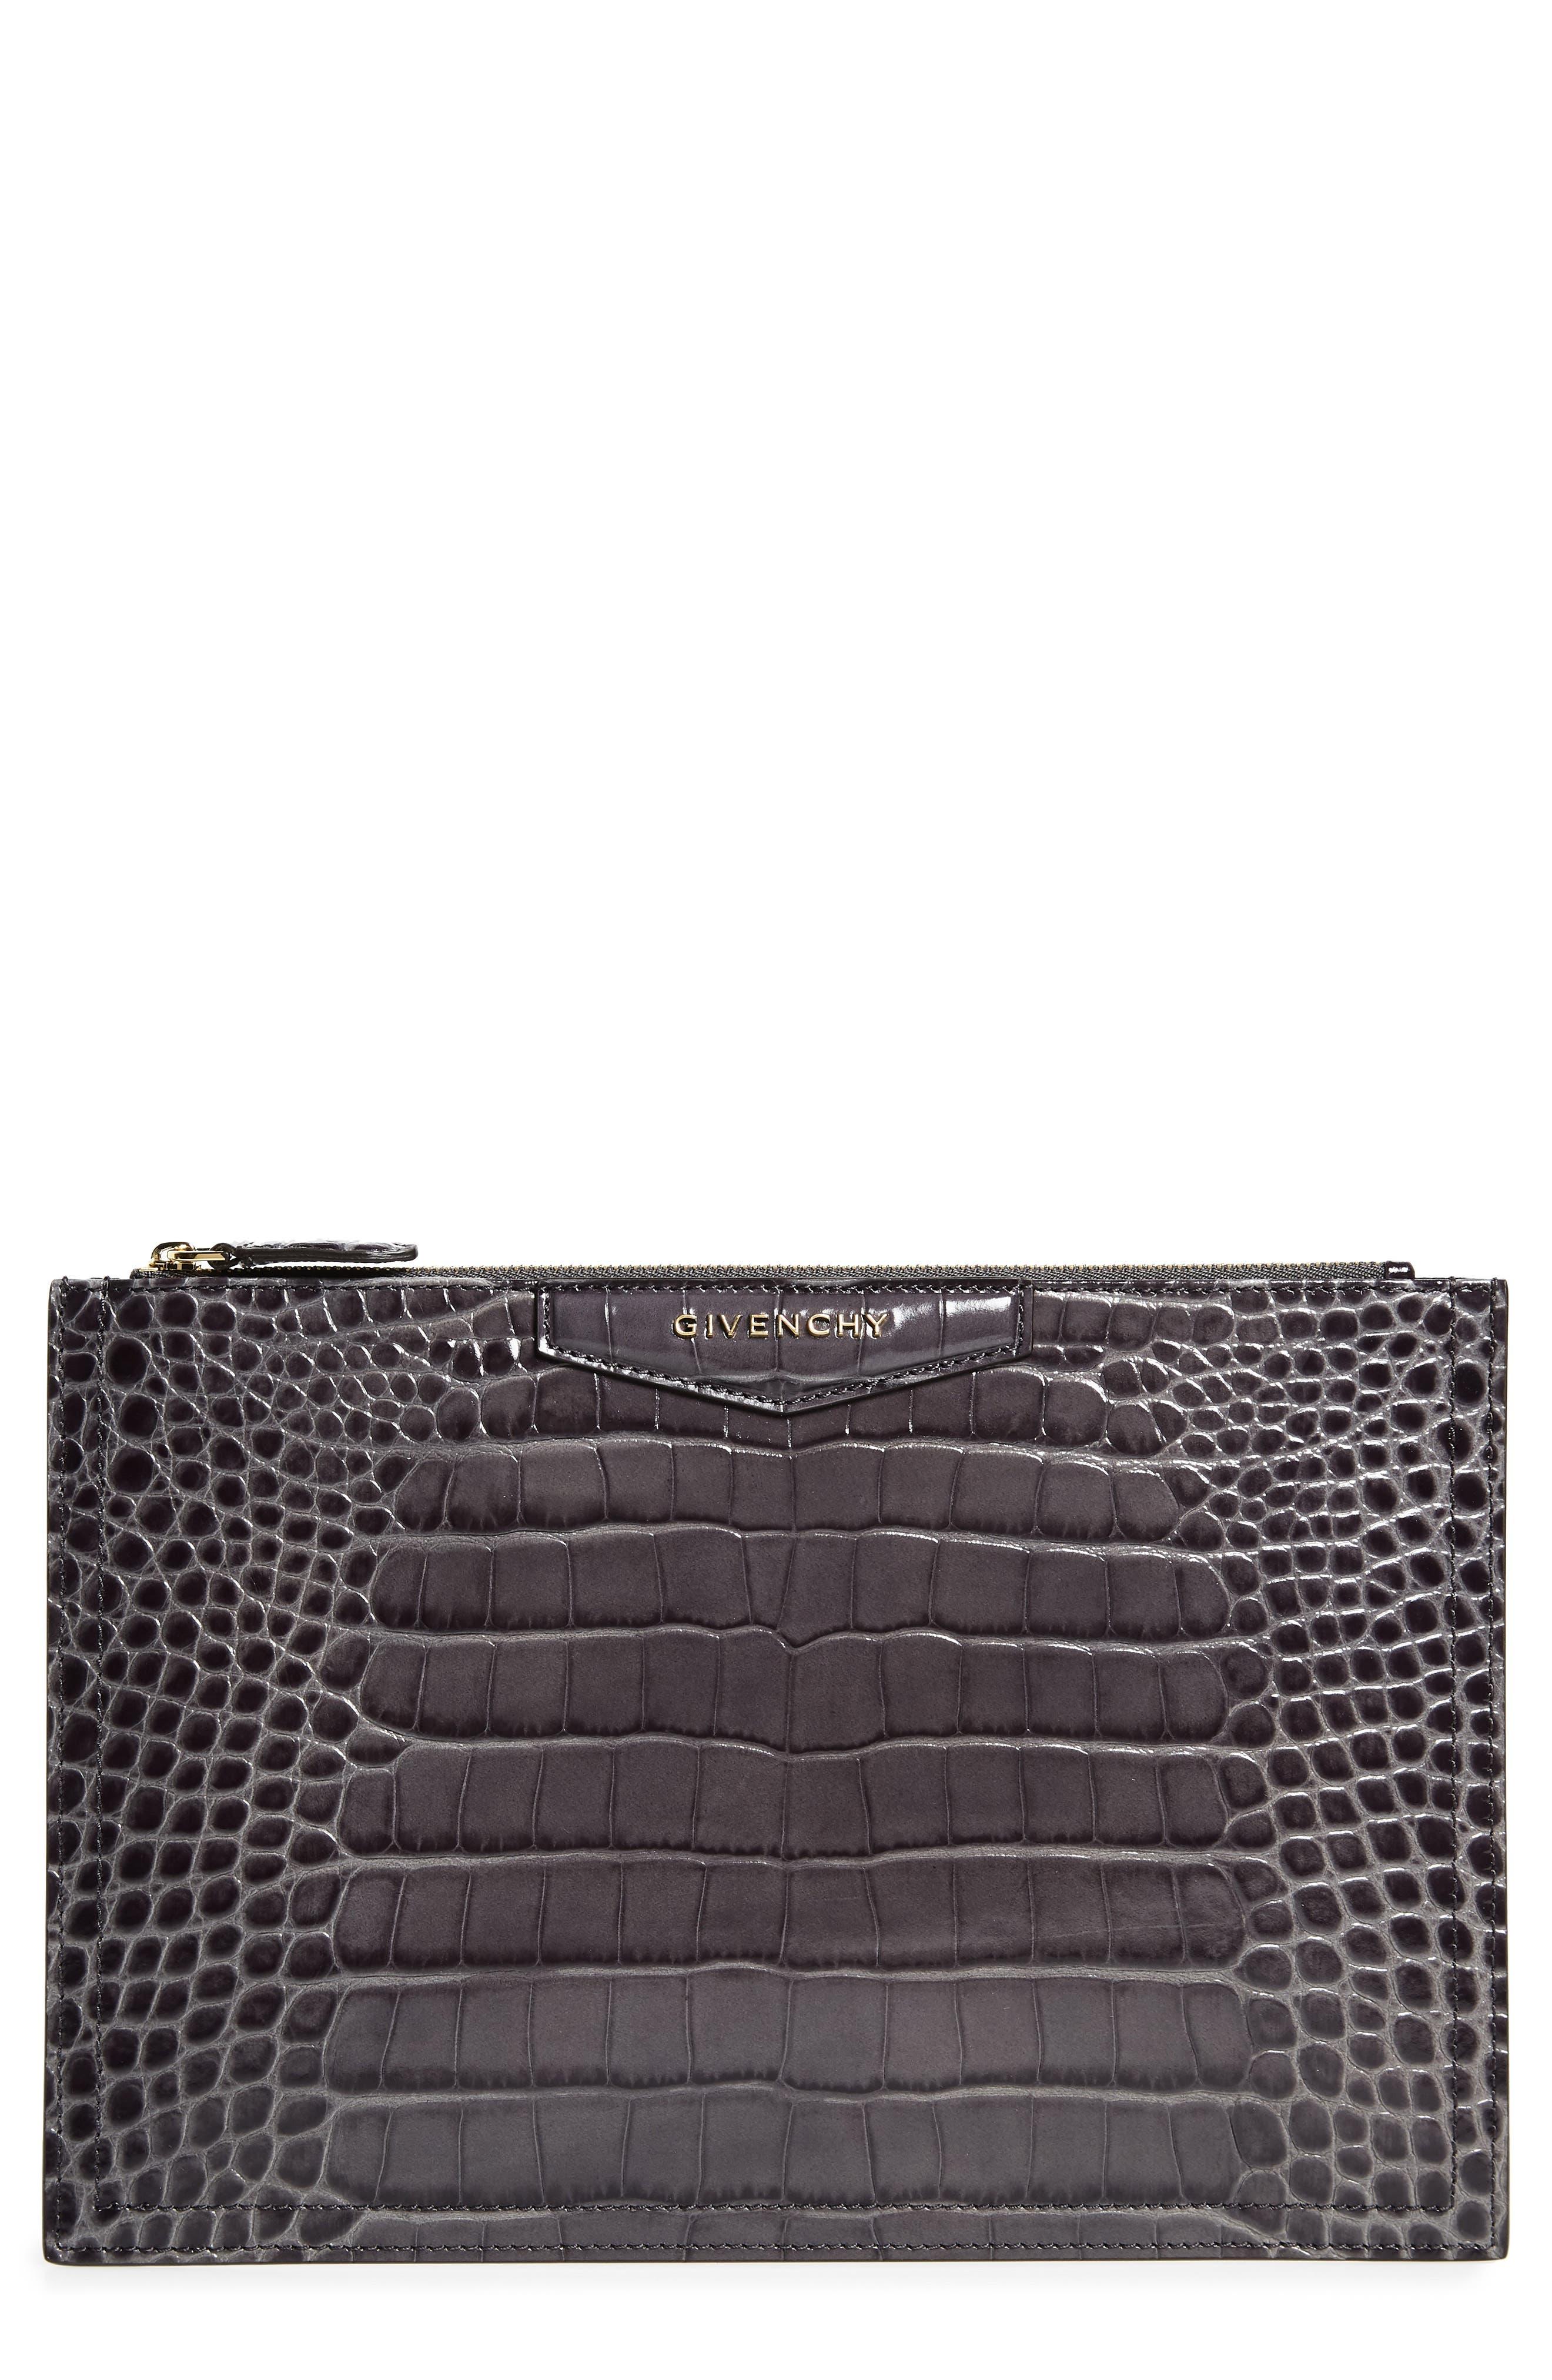 Givenchy Medium Antigona Croc Embossed Leather Pouch | Nordstrom